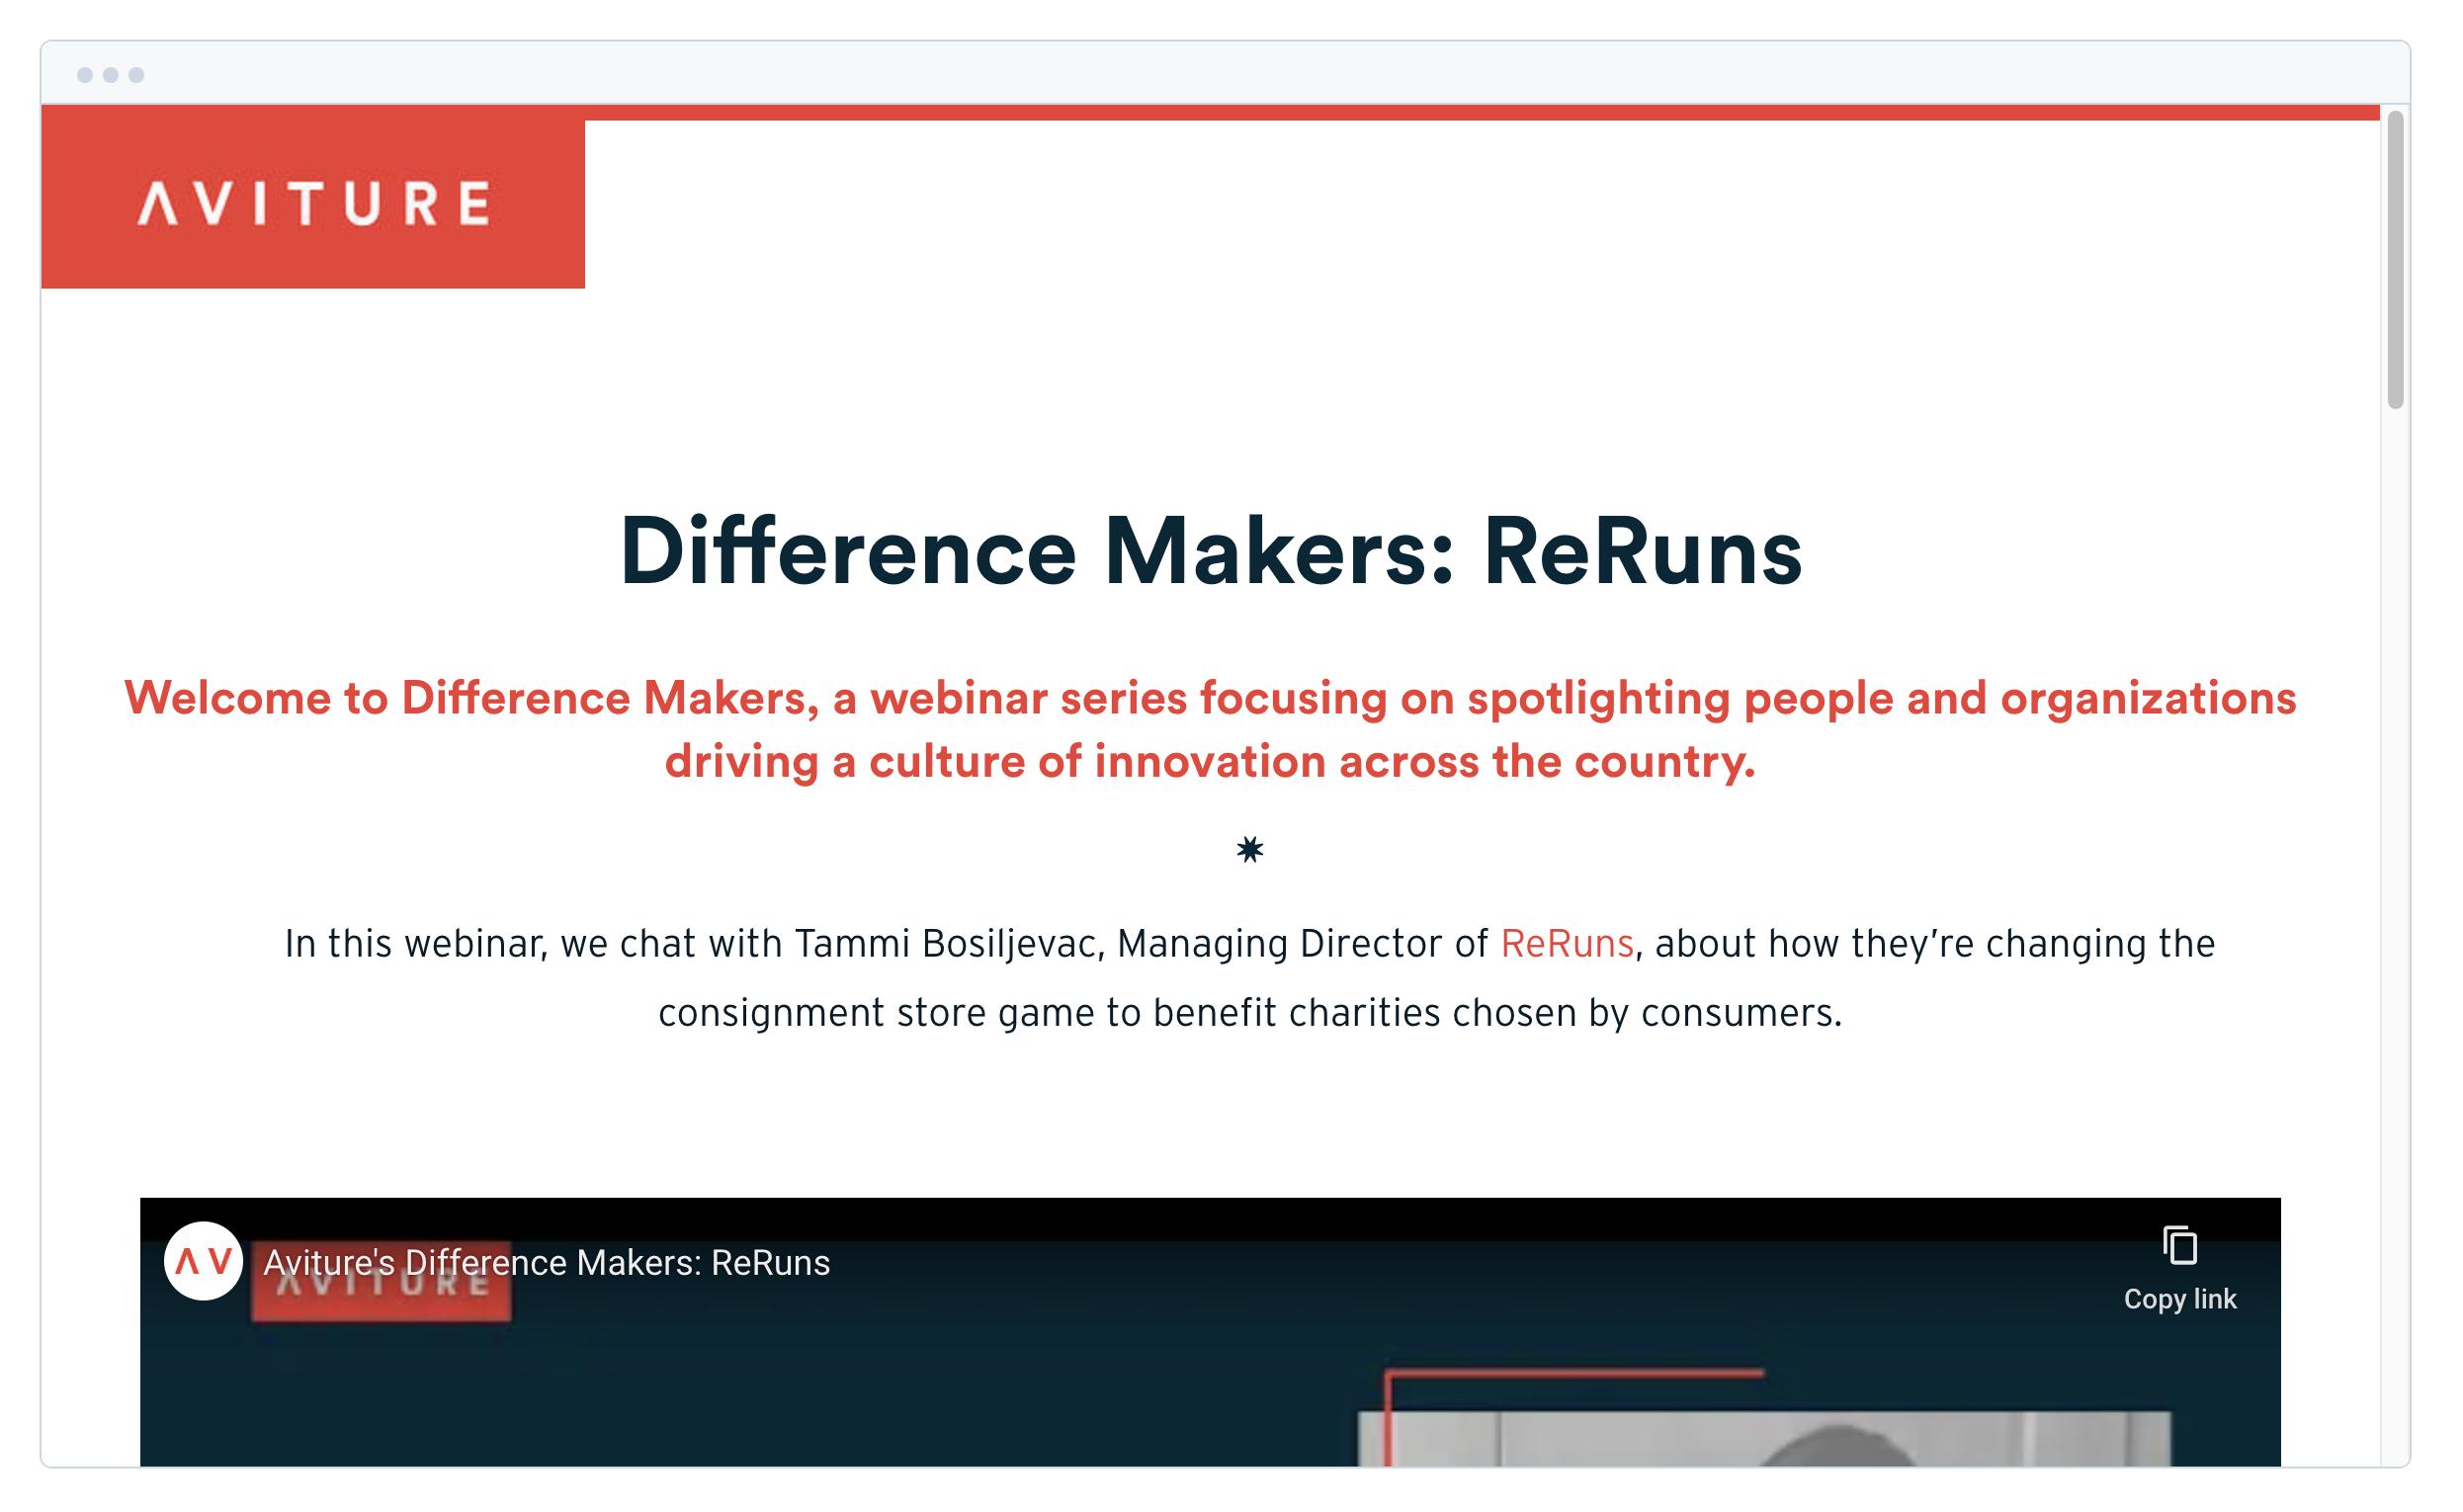 Difference Makers: Meet Tammi Bosilijevac, Managing Director of ReRuns